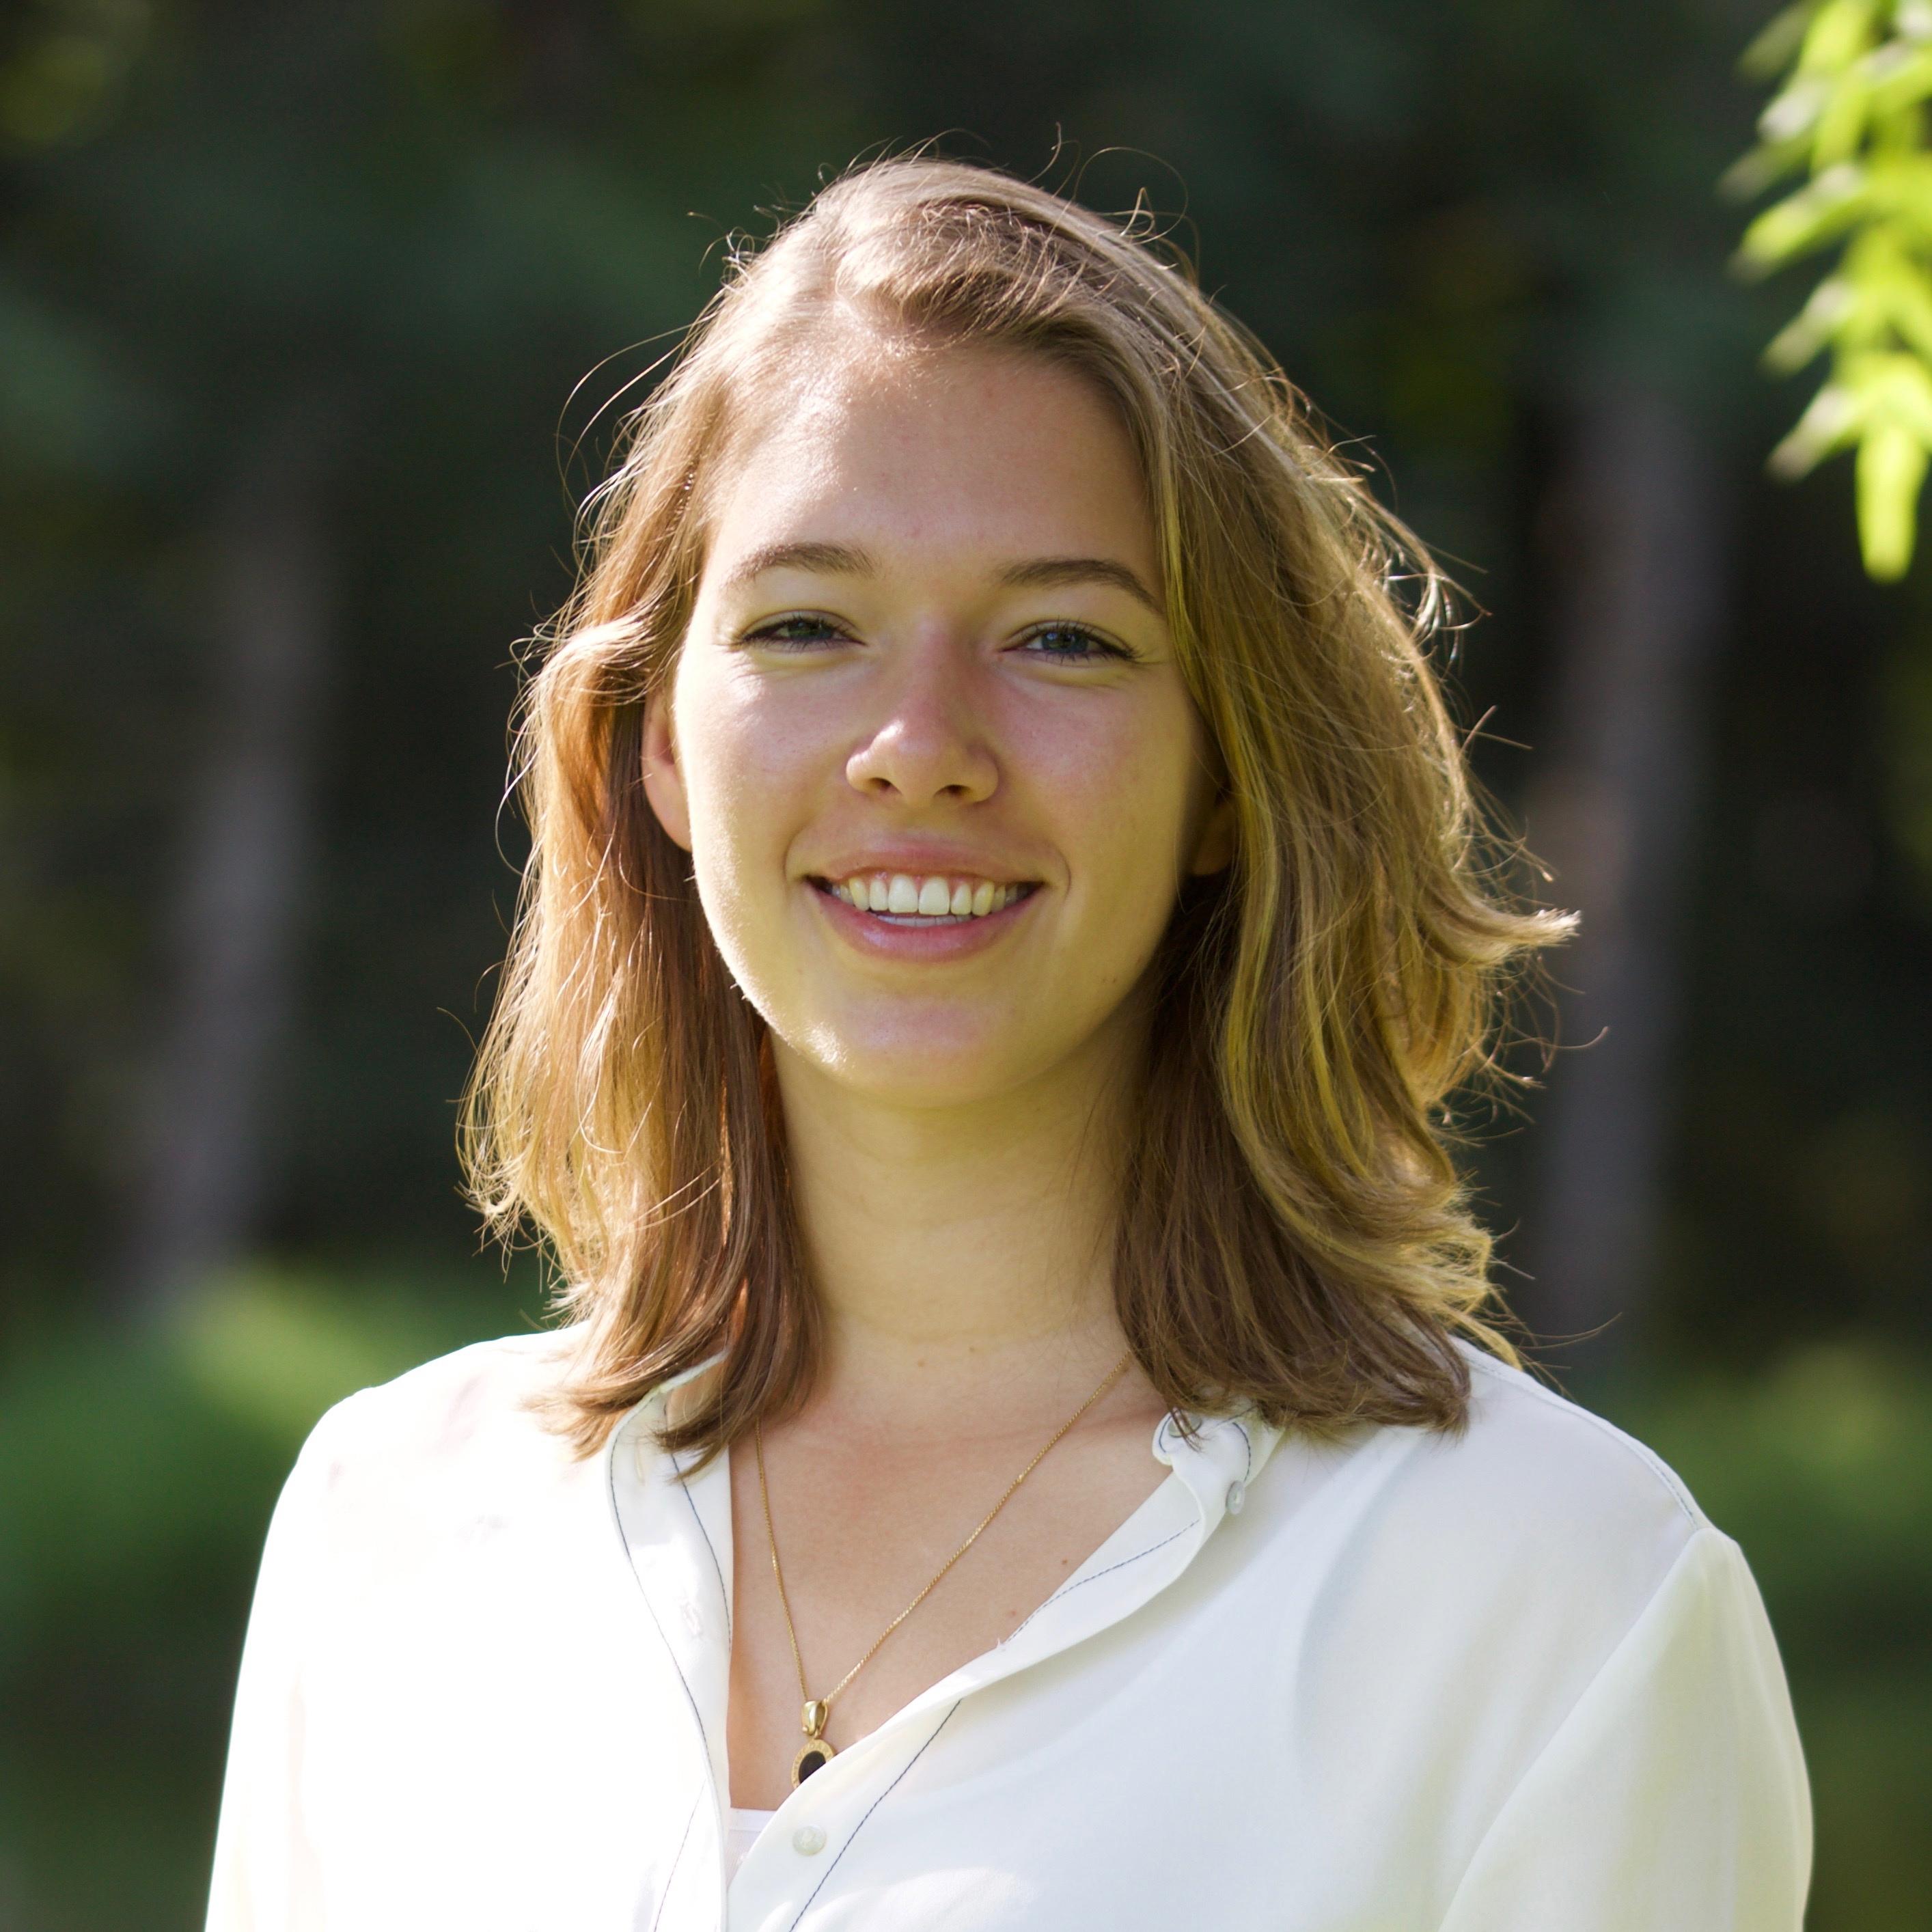 Jessica Lambregts